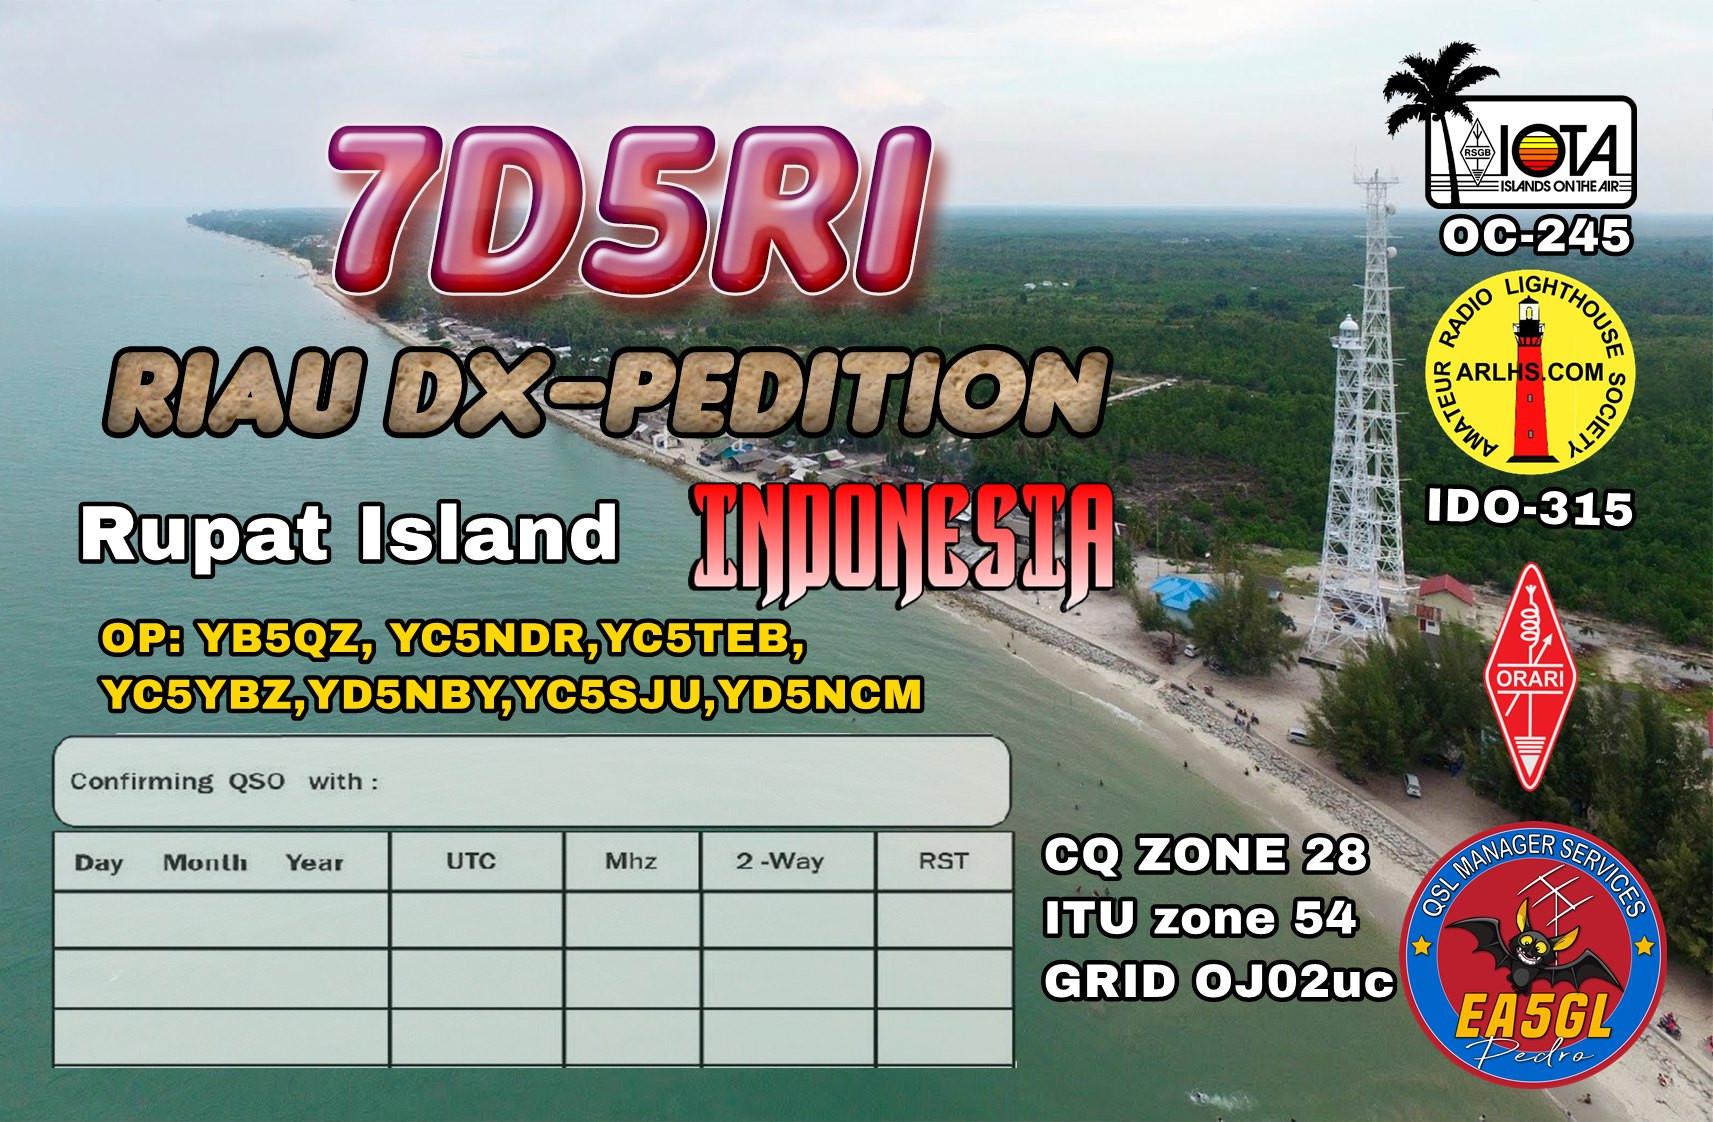 7D5RI Rupat Island QSL 2